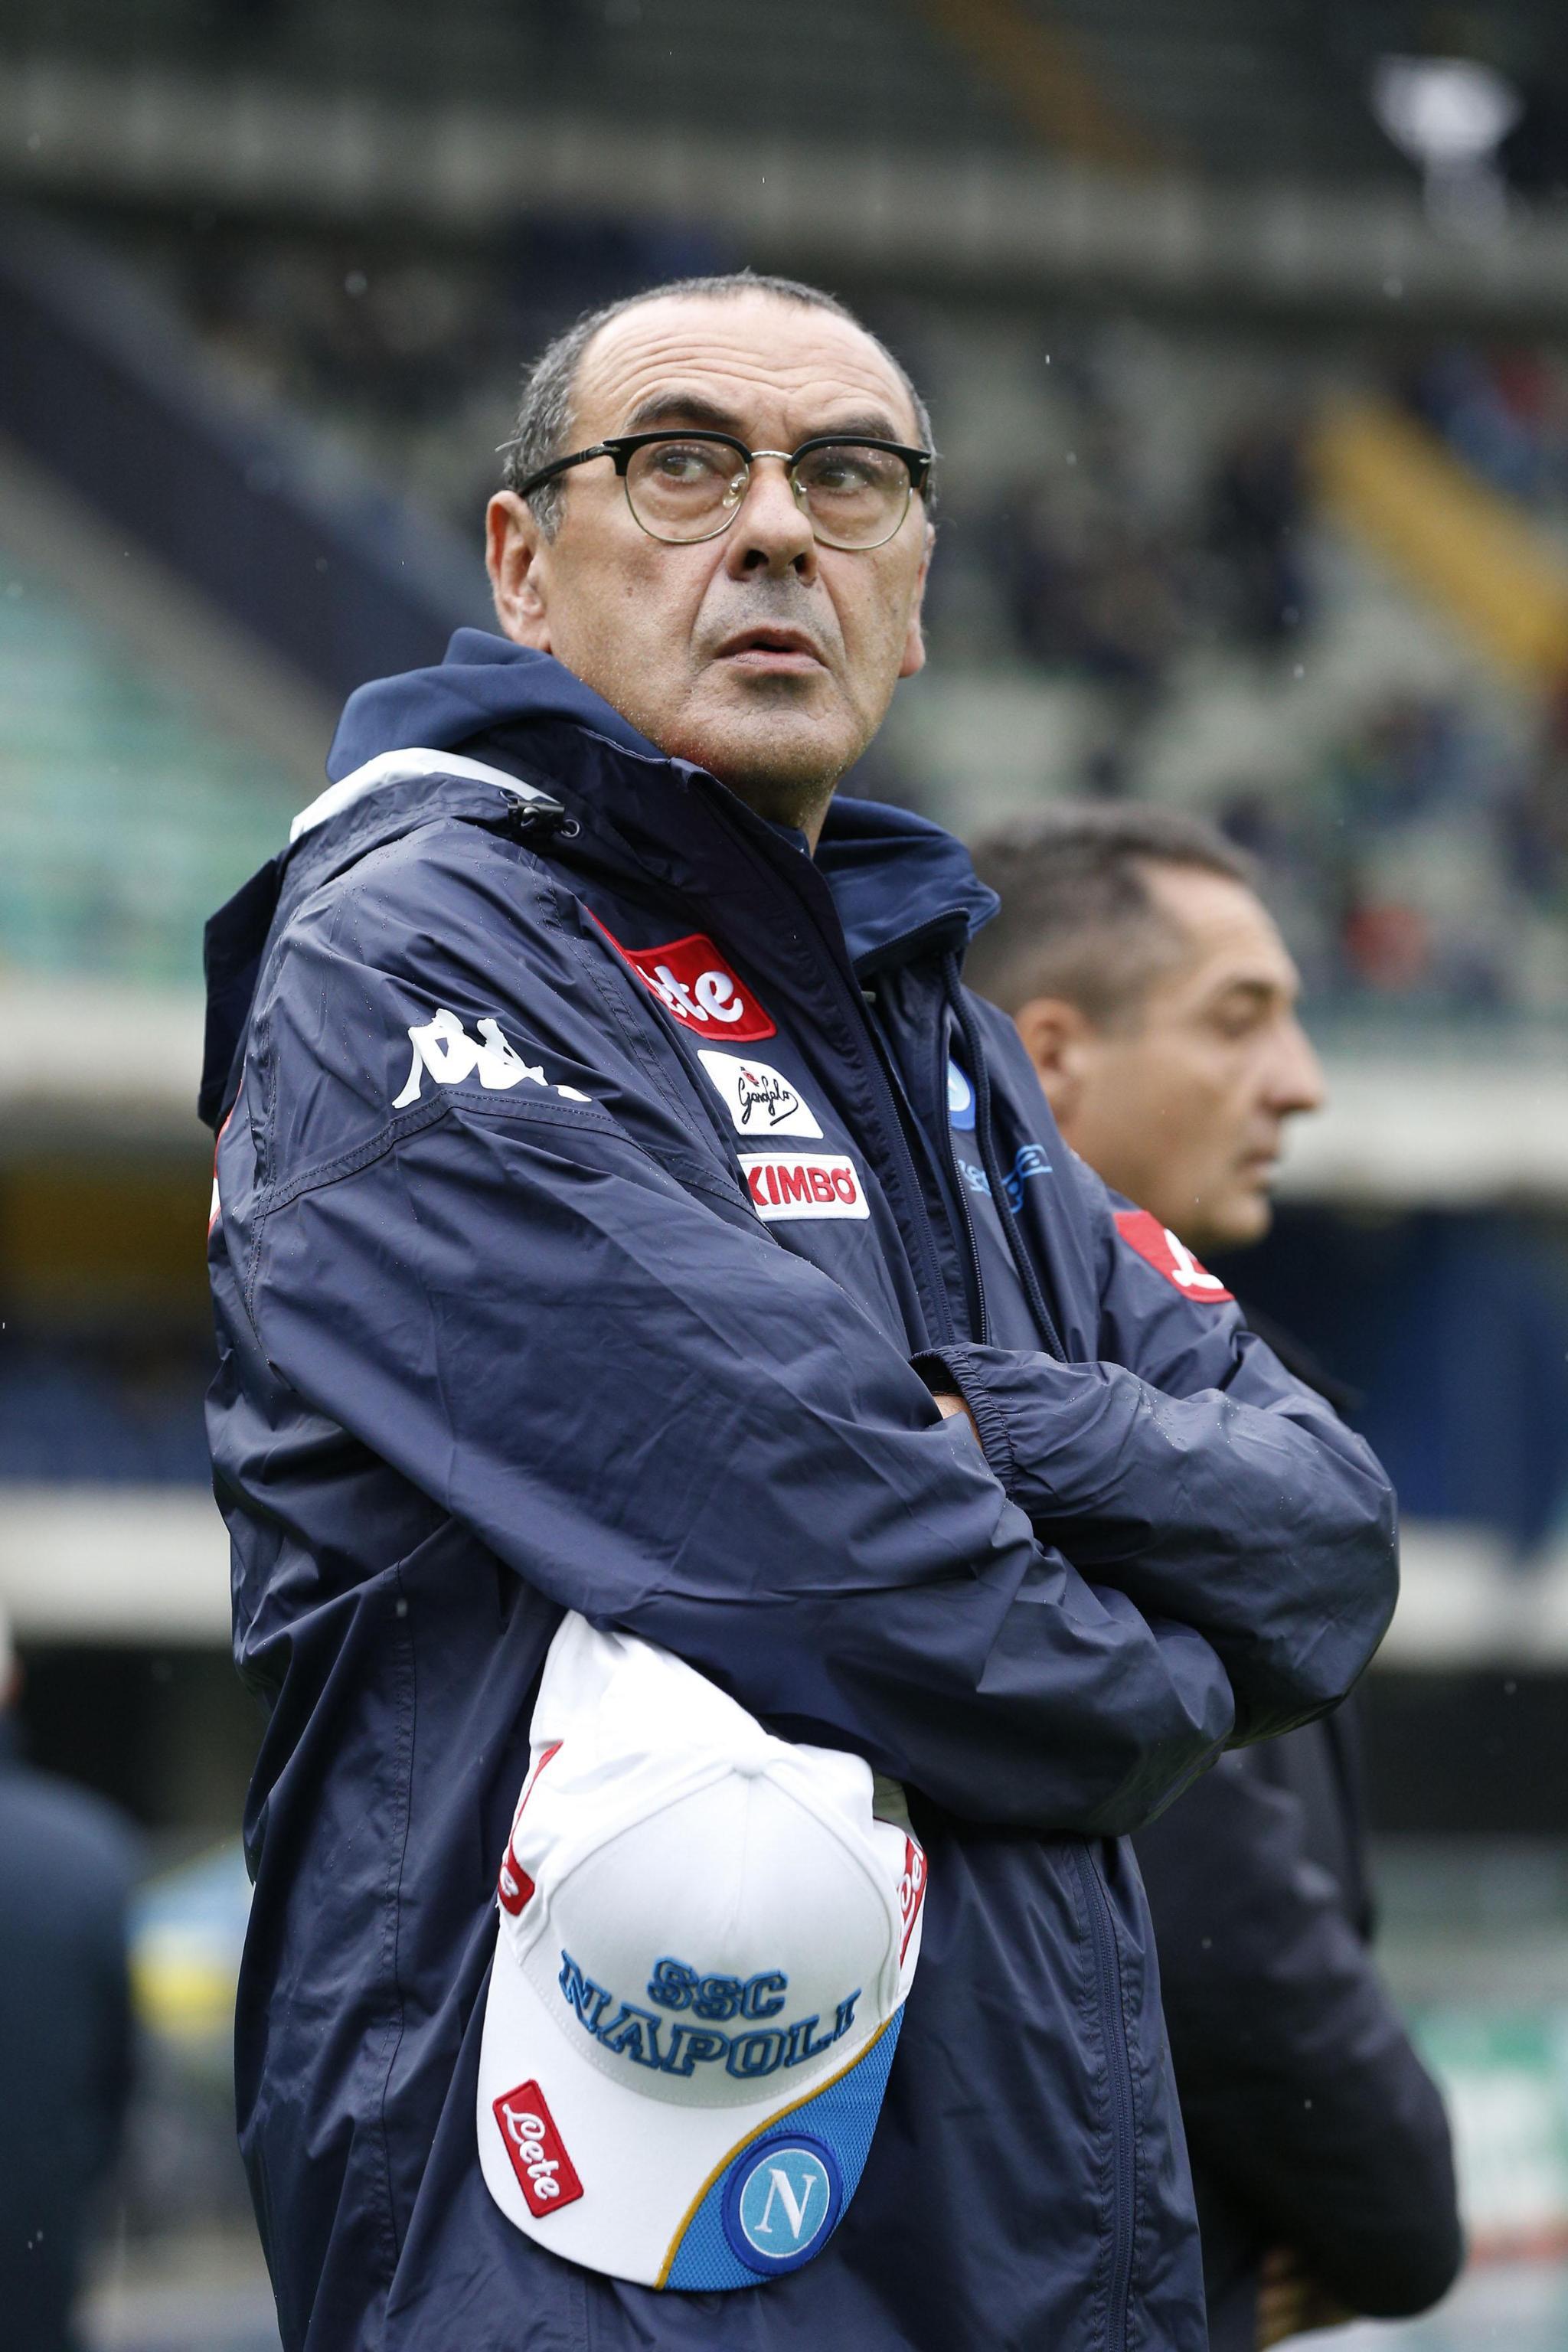 Ranking Uefa: Juve quinta, Napoli 12/o